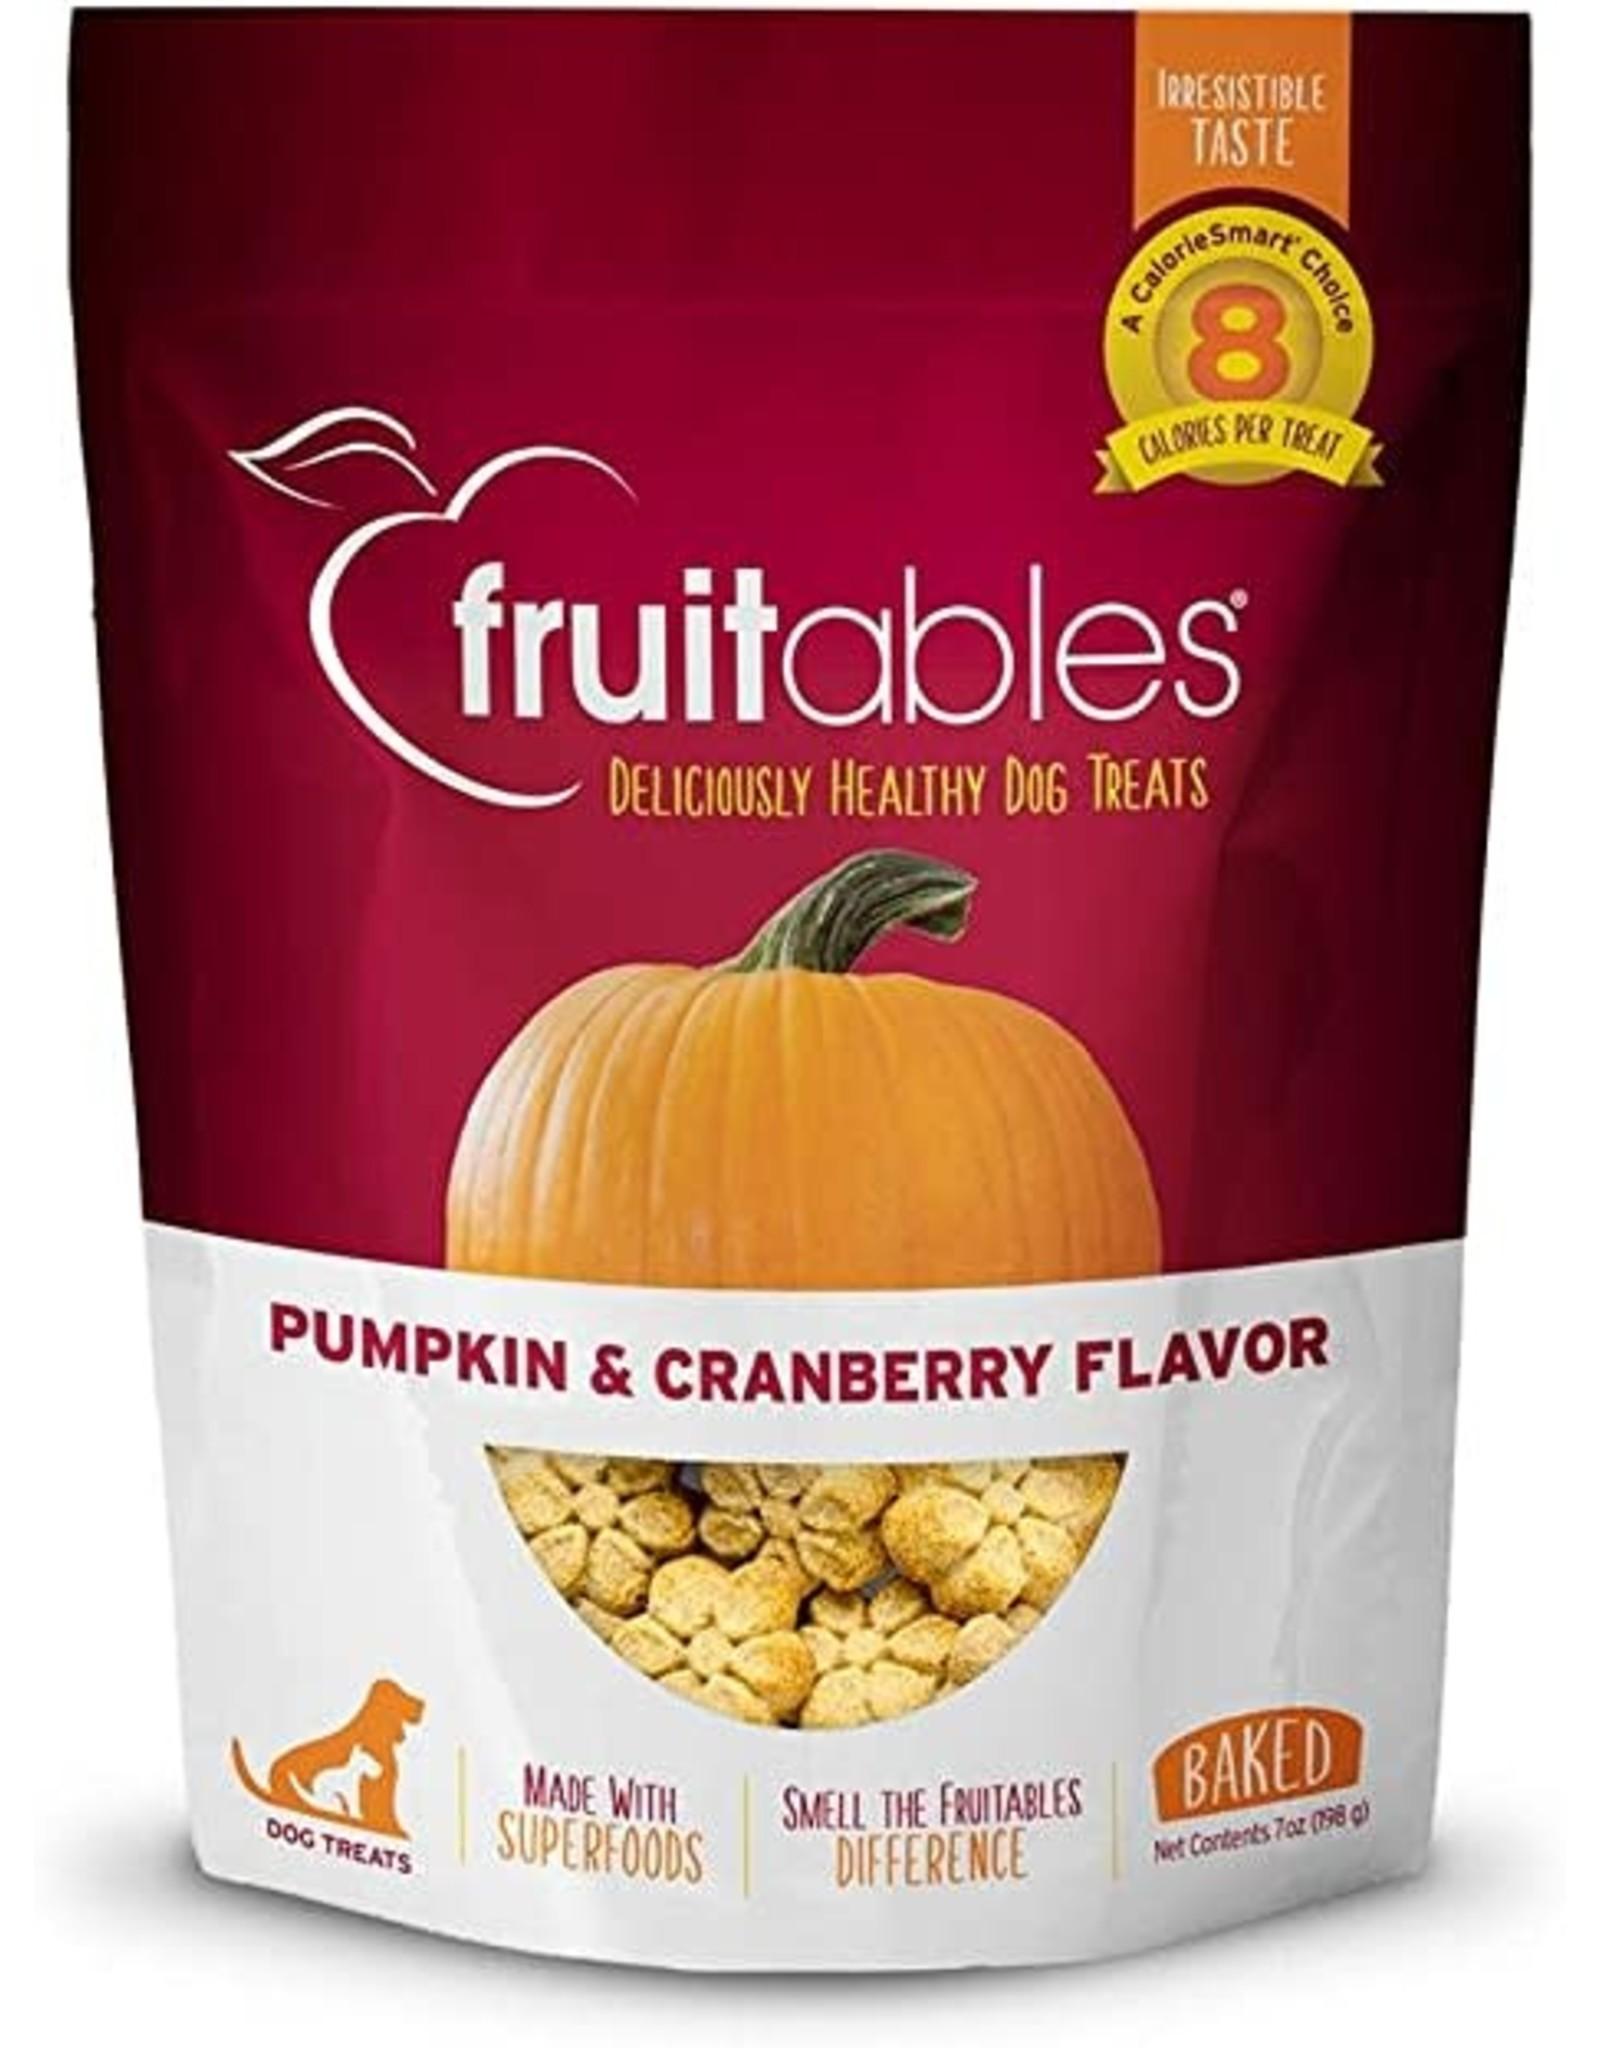 Fruitables Fruitables / Pumpkin & Cranberry 7oz